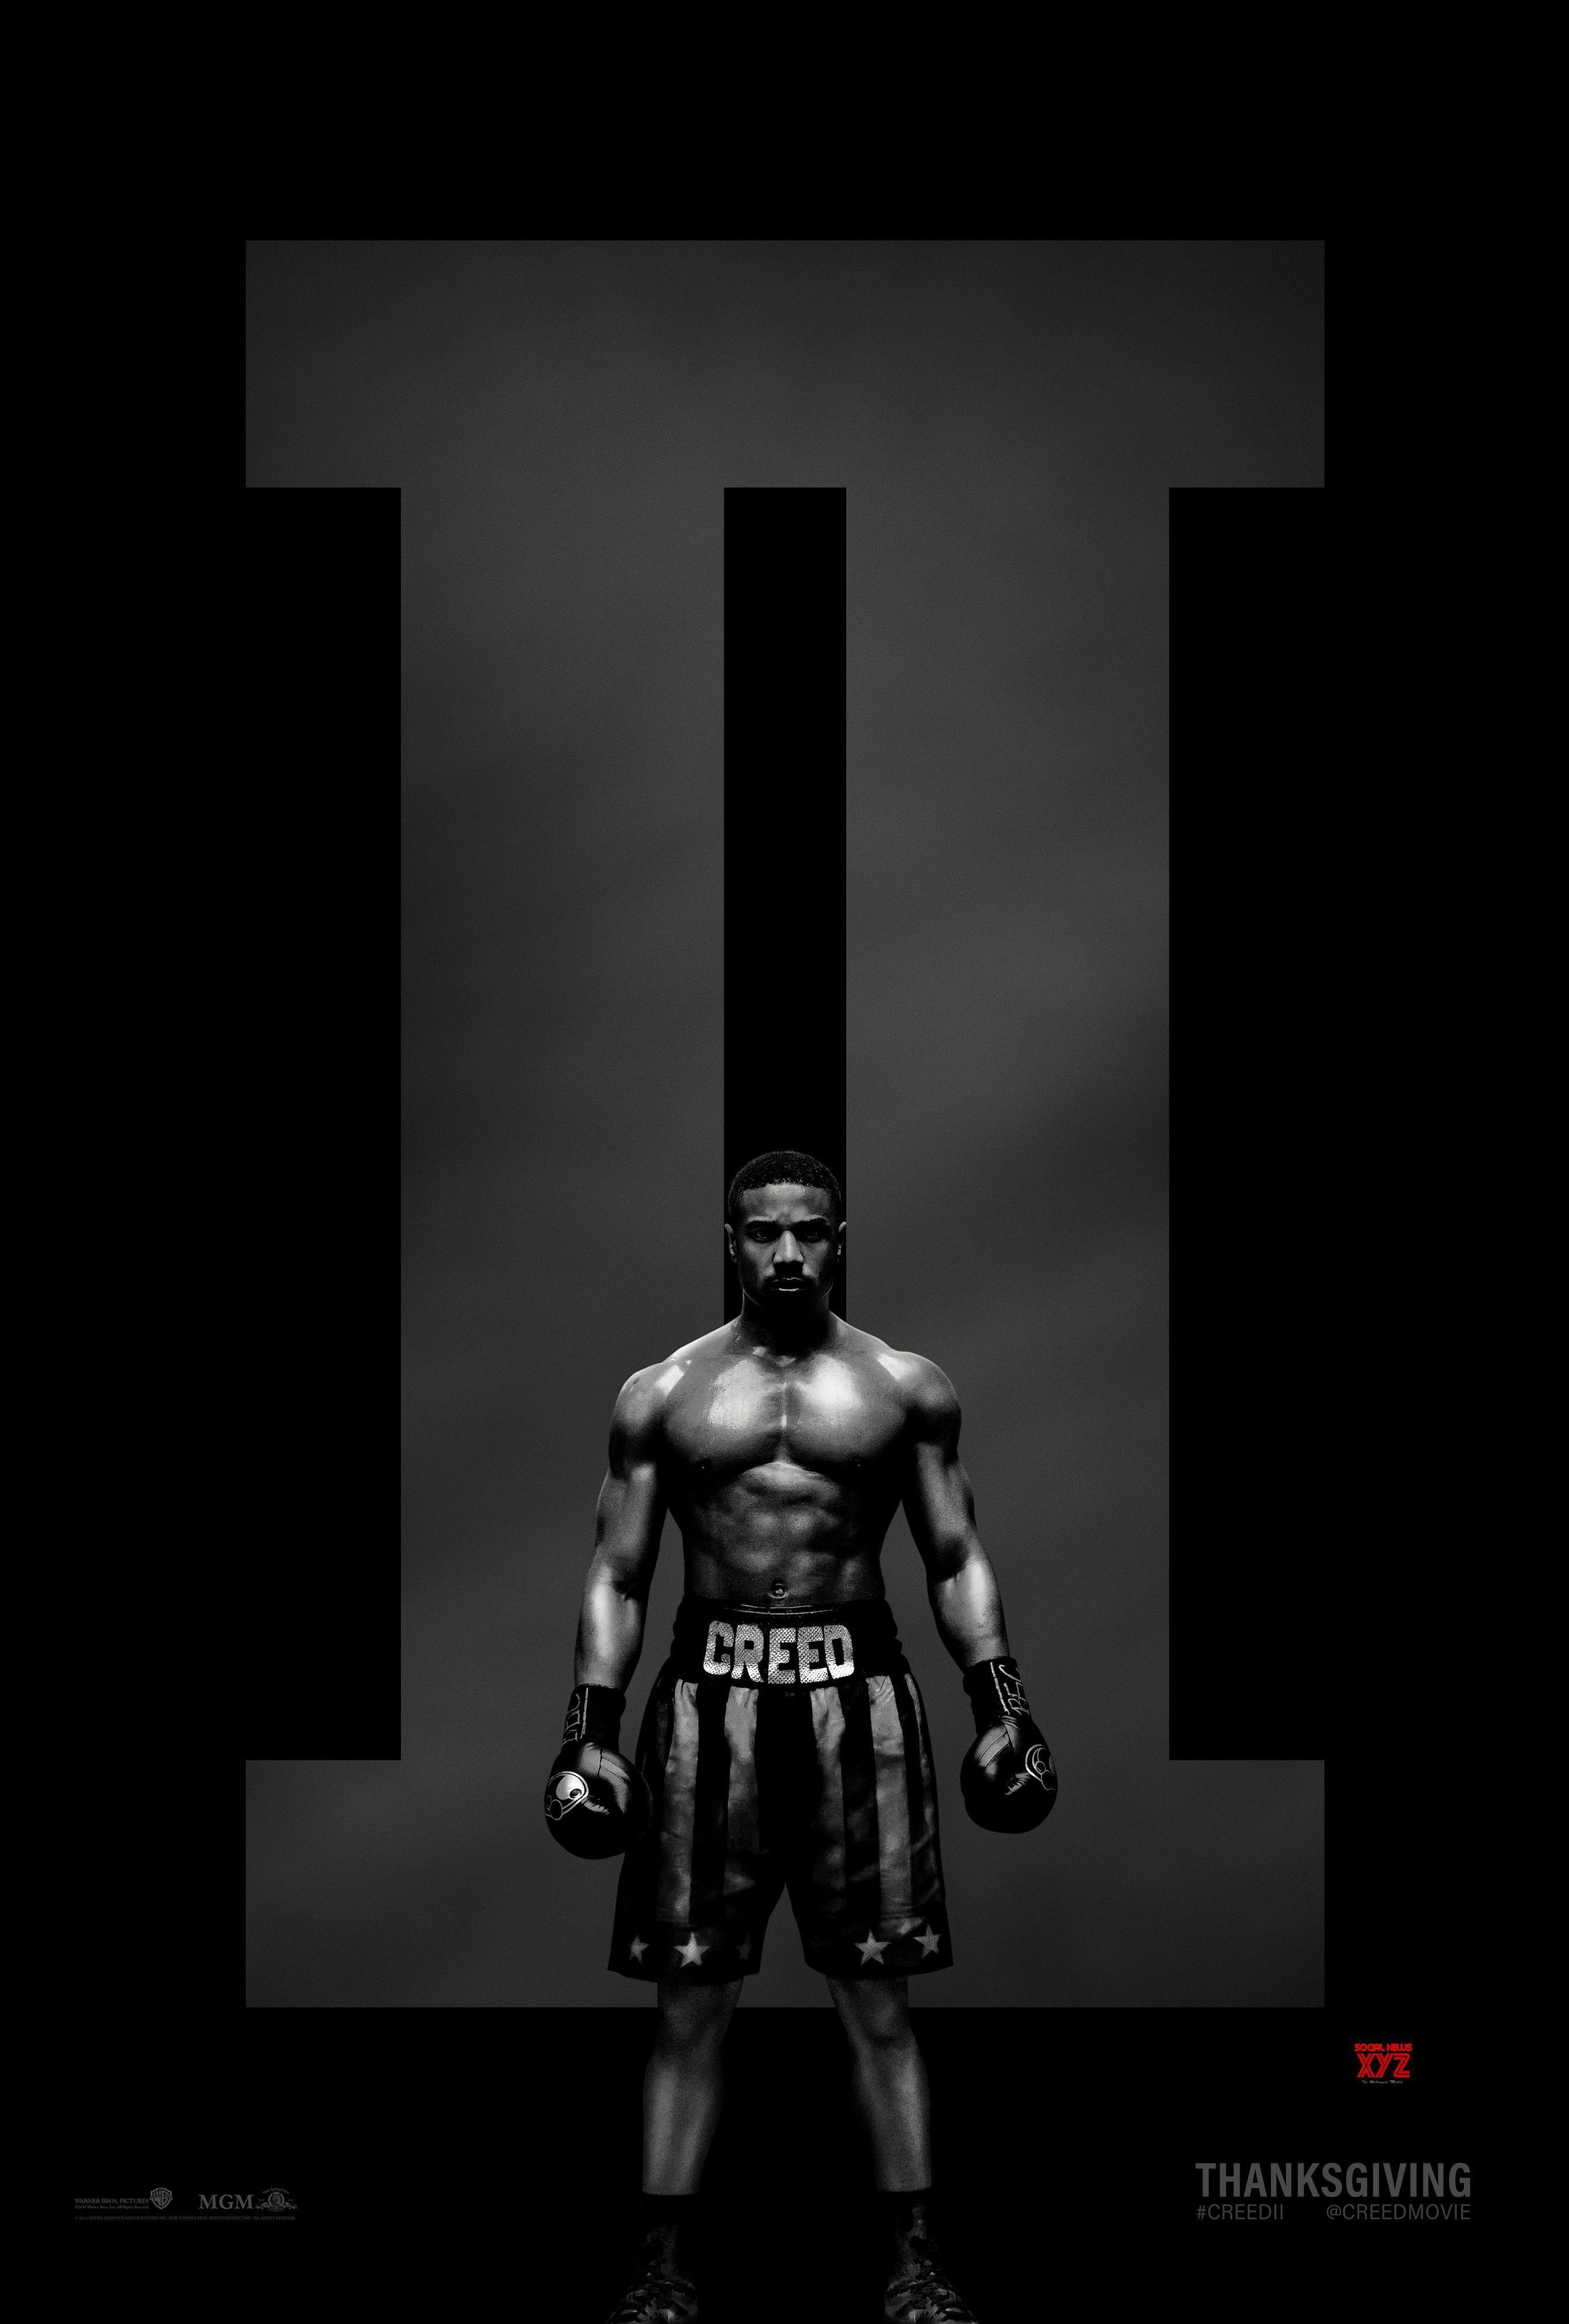 Creed Ii Movie Hd Poster Social News Xyz Gallery Pinterest